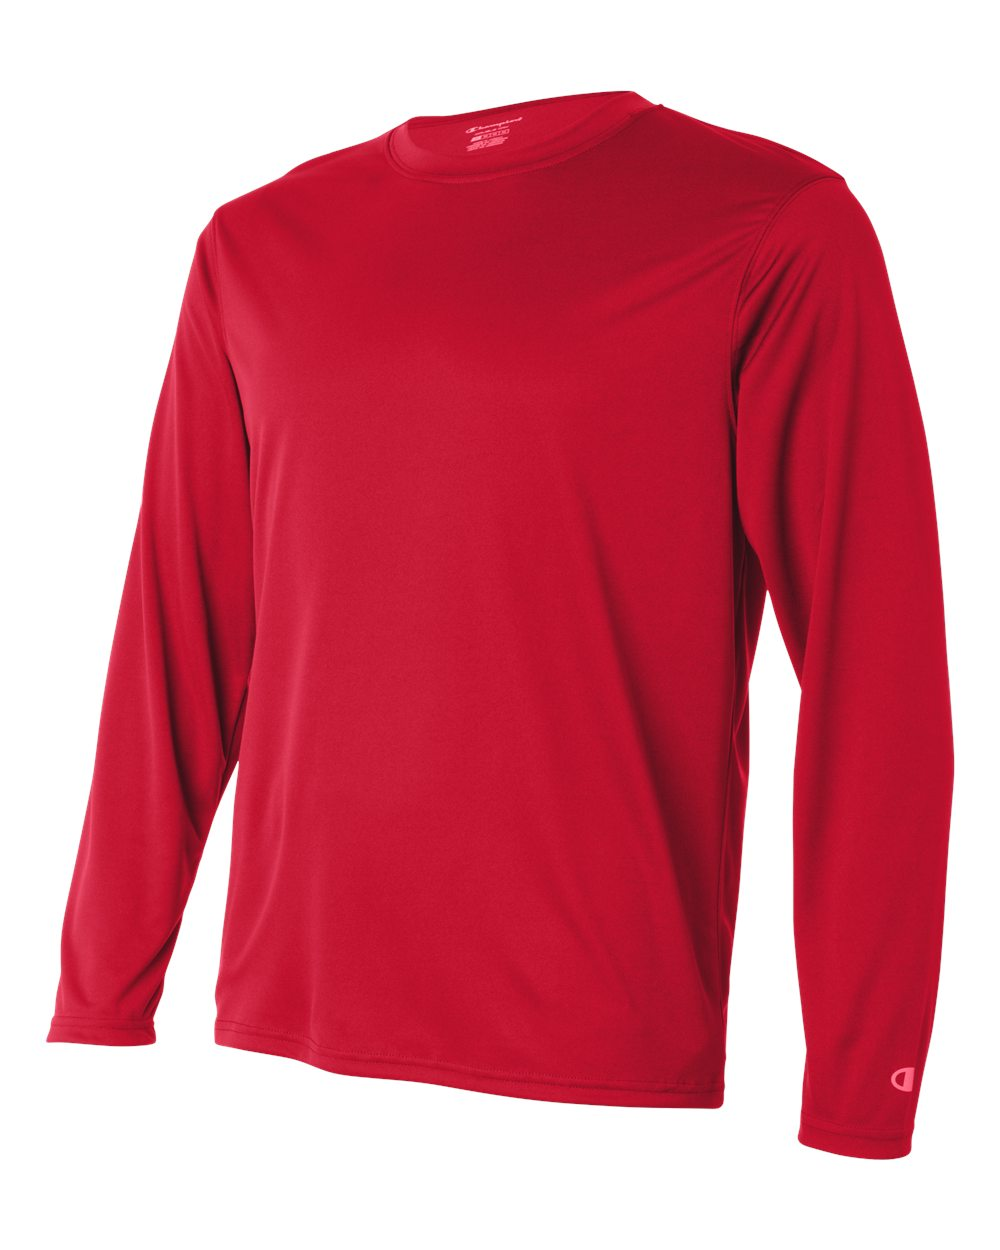 Champion-Men-039-s-Double-Dry-4-1-oz-Long-Sleeve-Interlock-T-Shirt-CW26-XS-3XL thumbnail 26